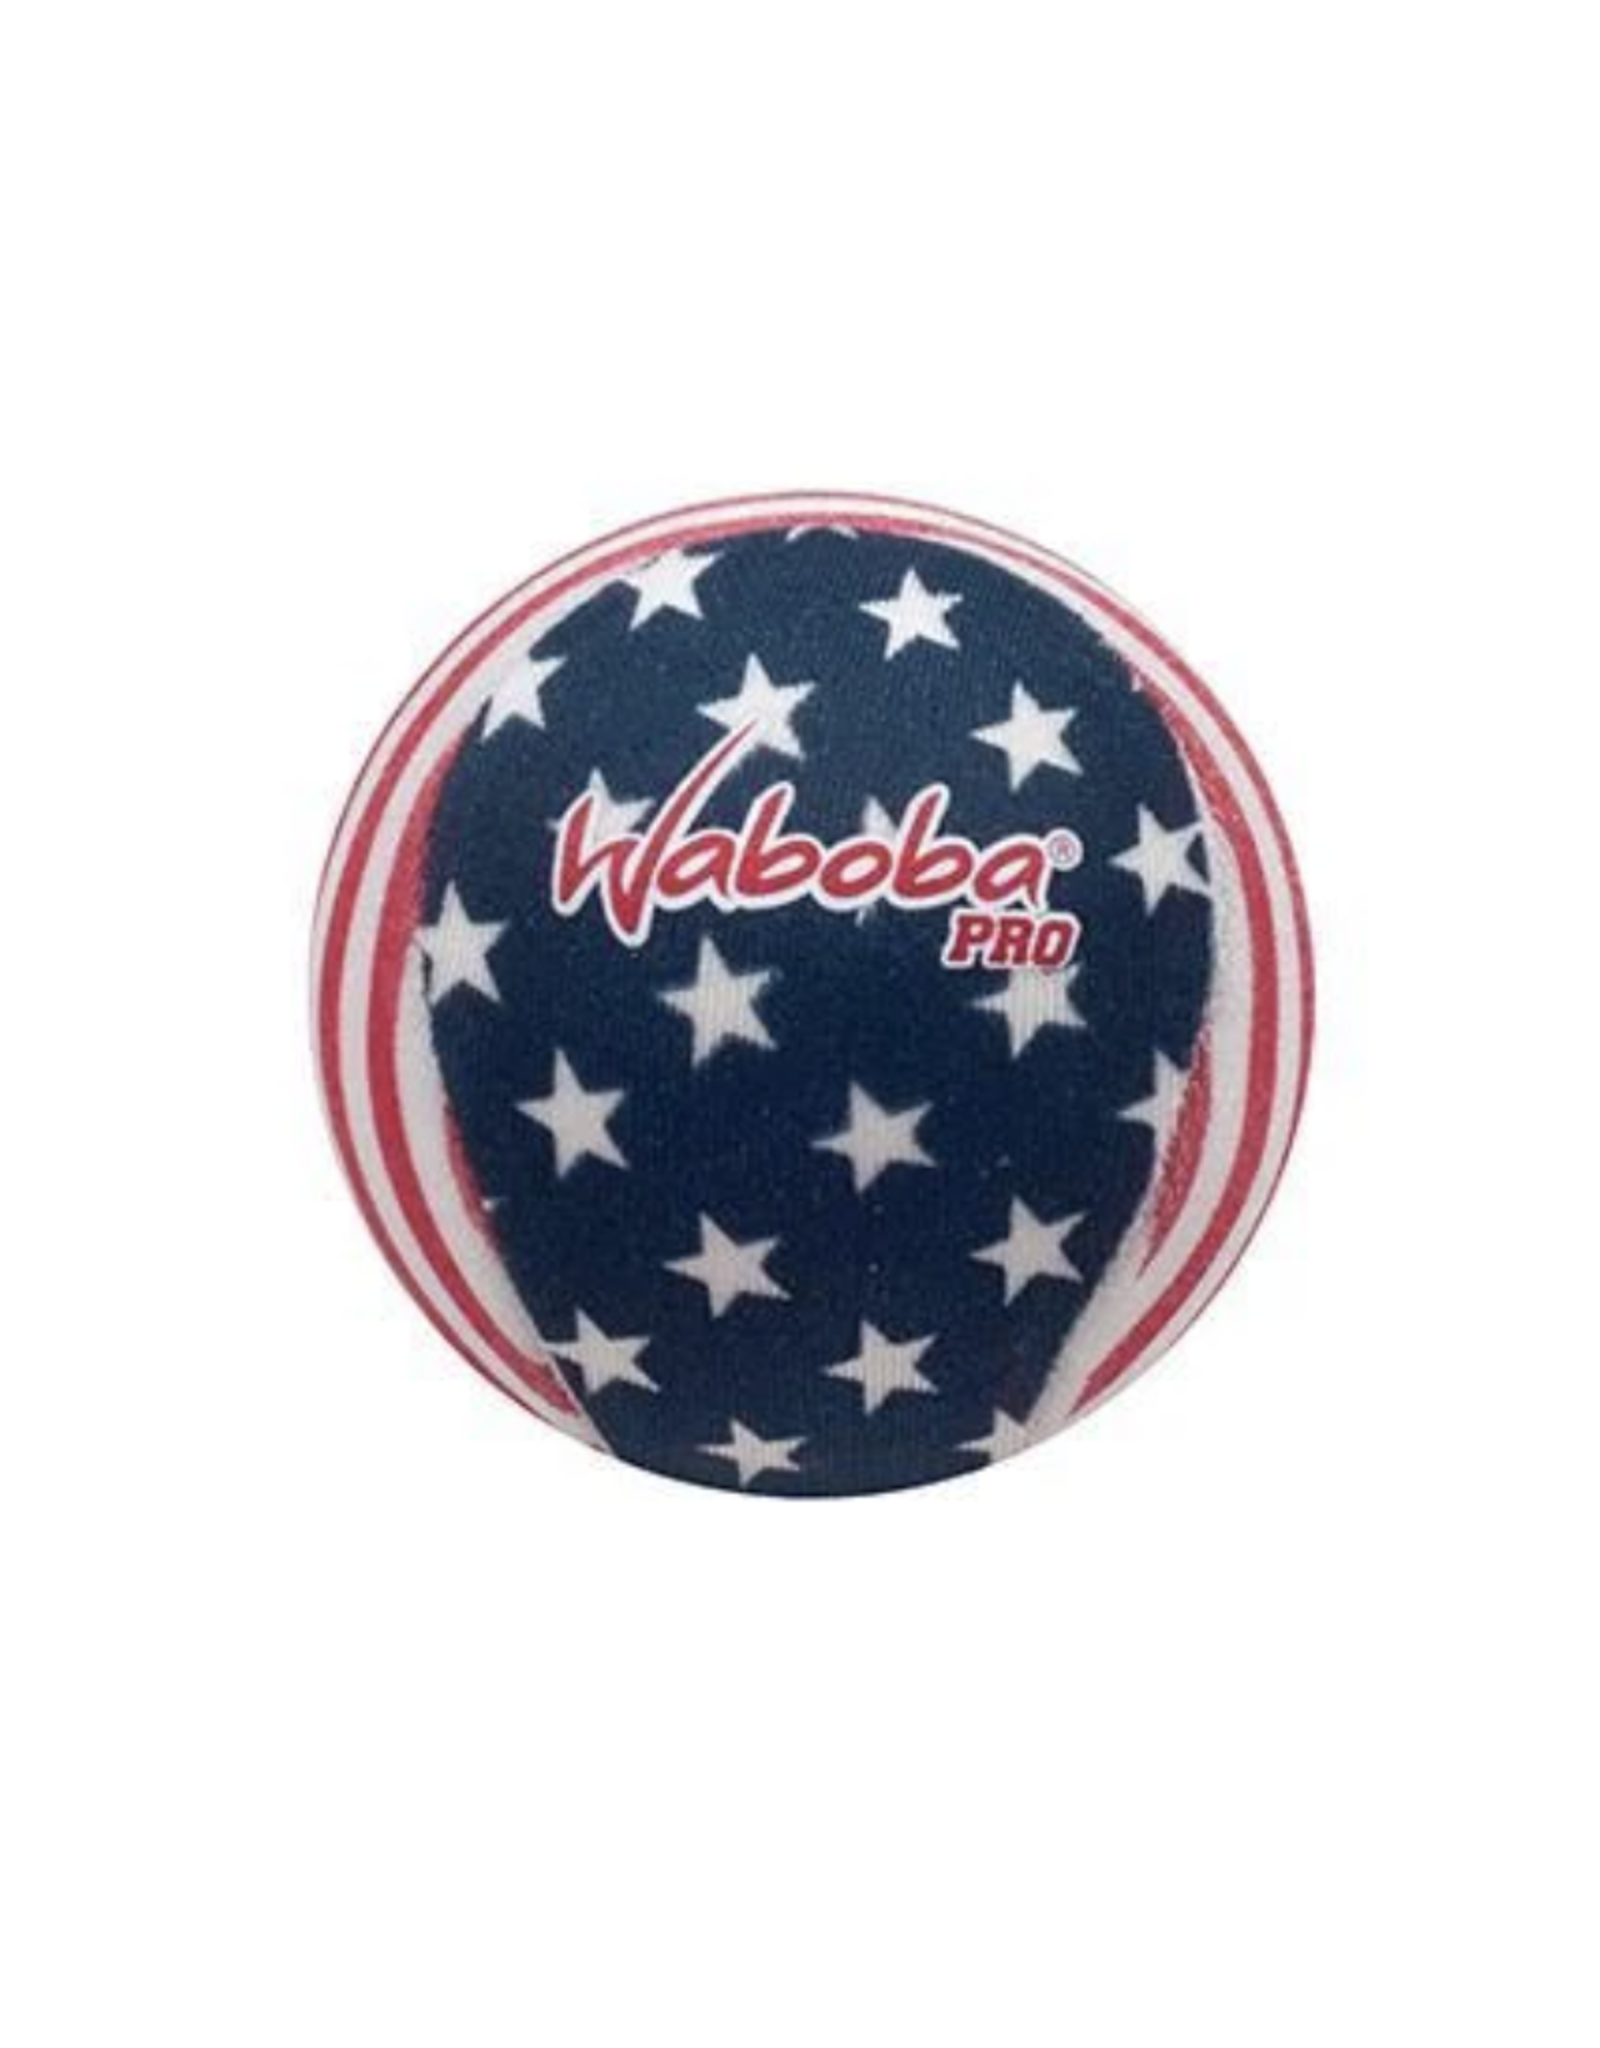 Waboba Waboba - Stars and Stripes PRO Ball